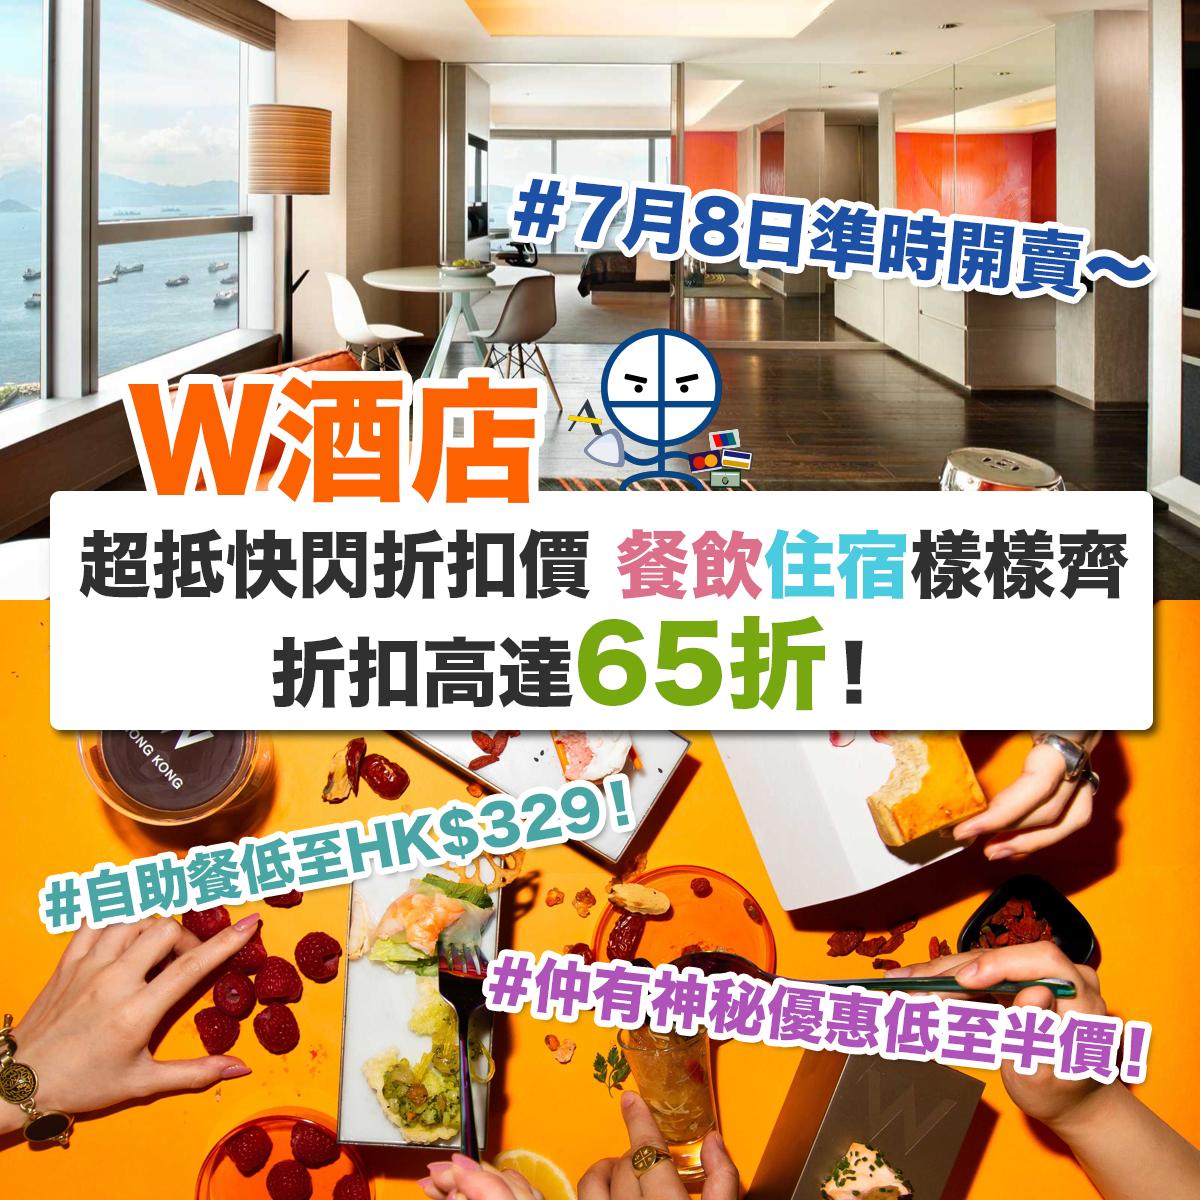 w-hotel-special-offer-W酒店-優惠